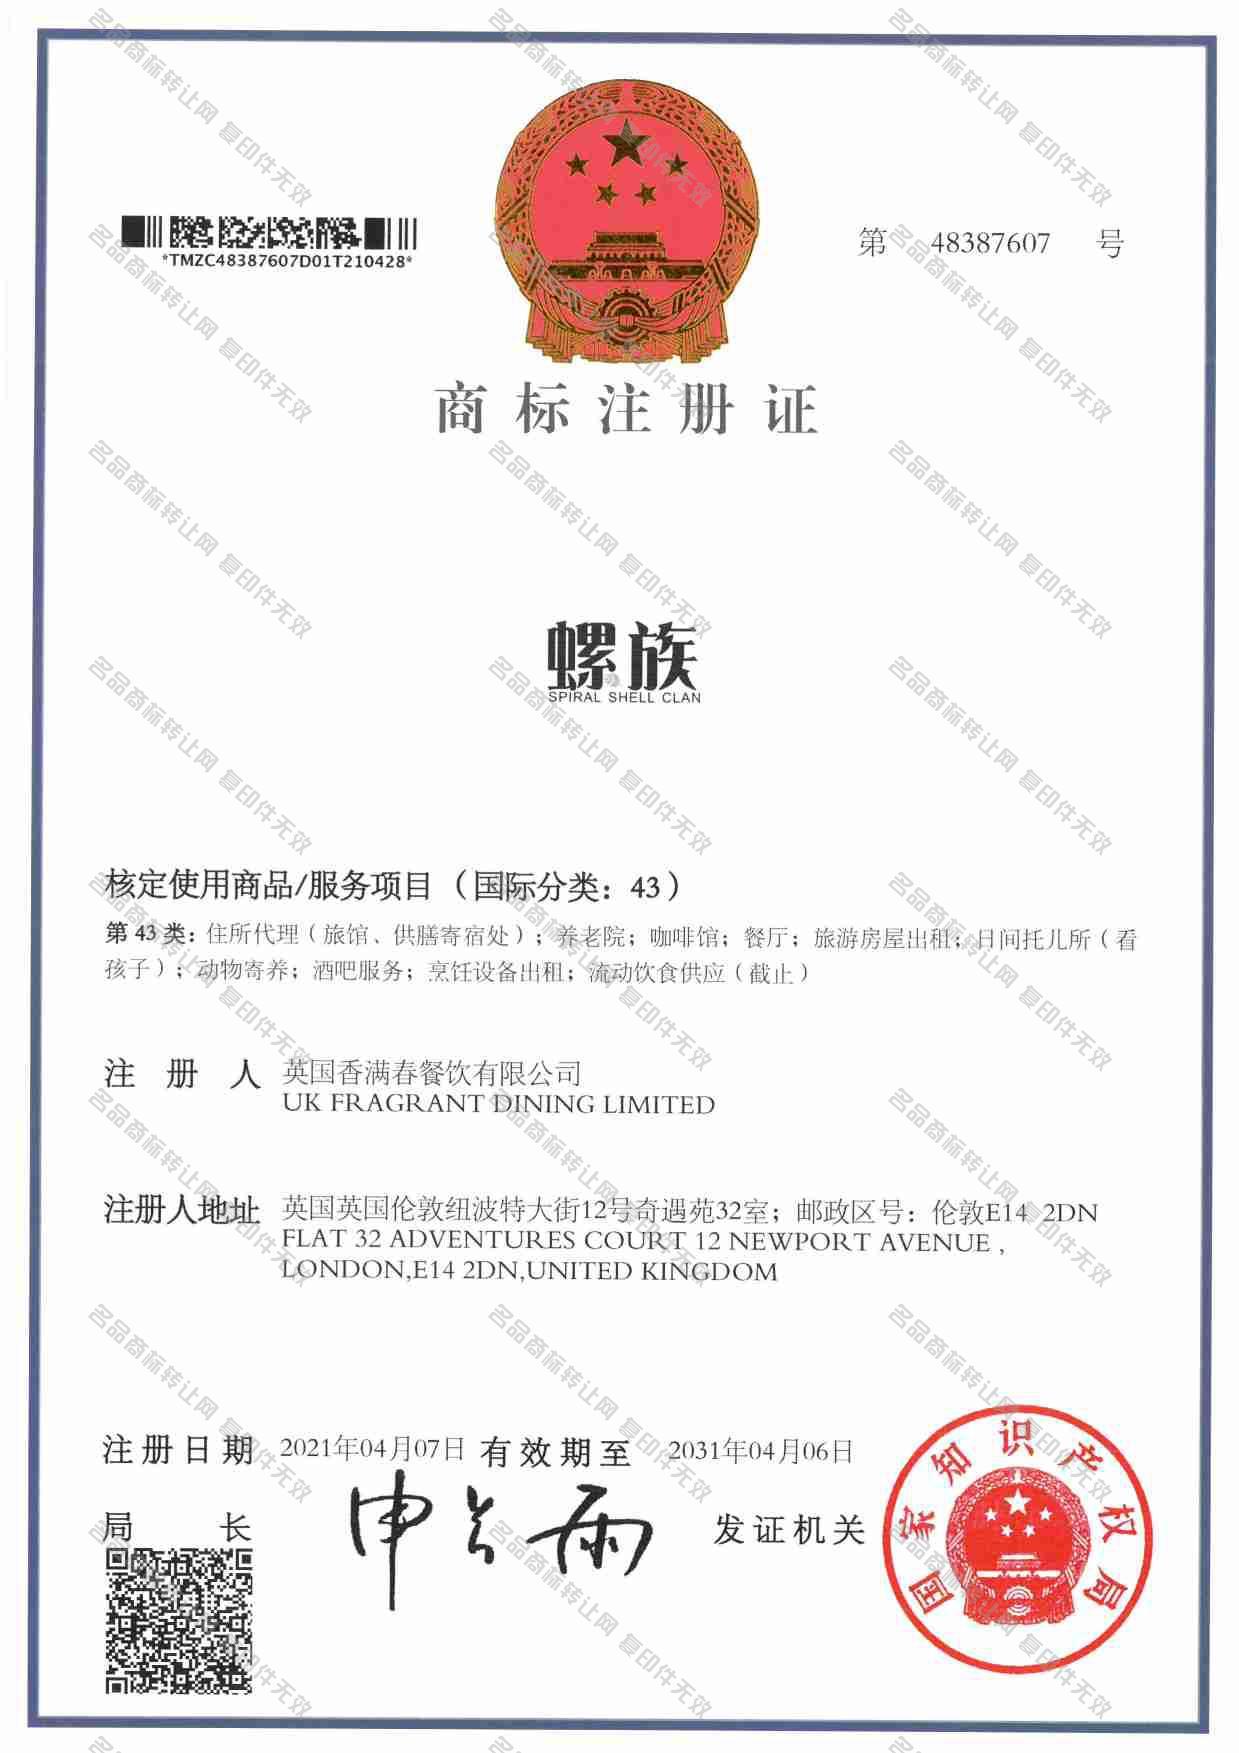 螺族 SPIRAL SHELL CLAN注册证